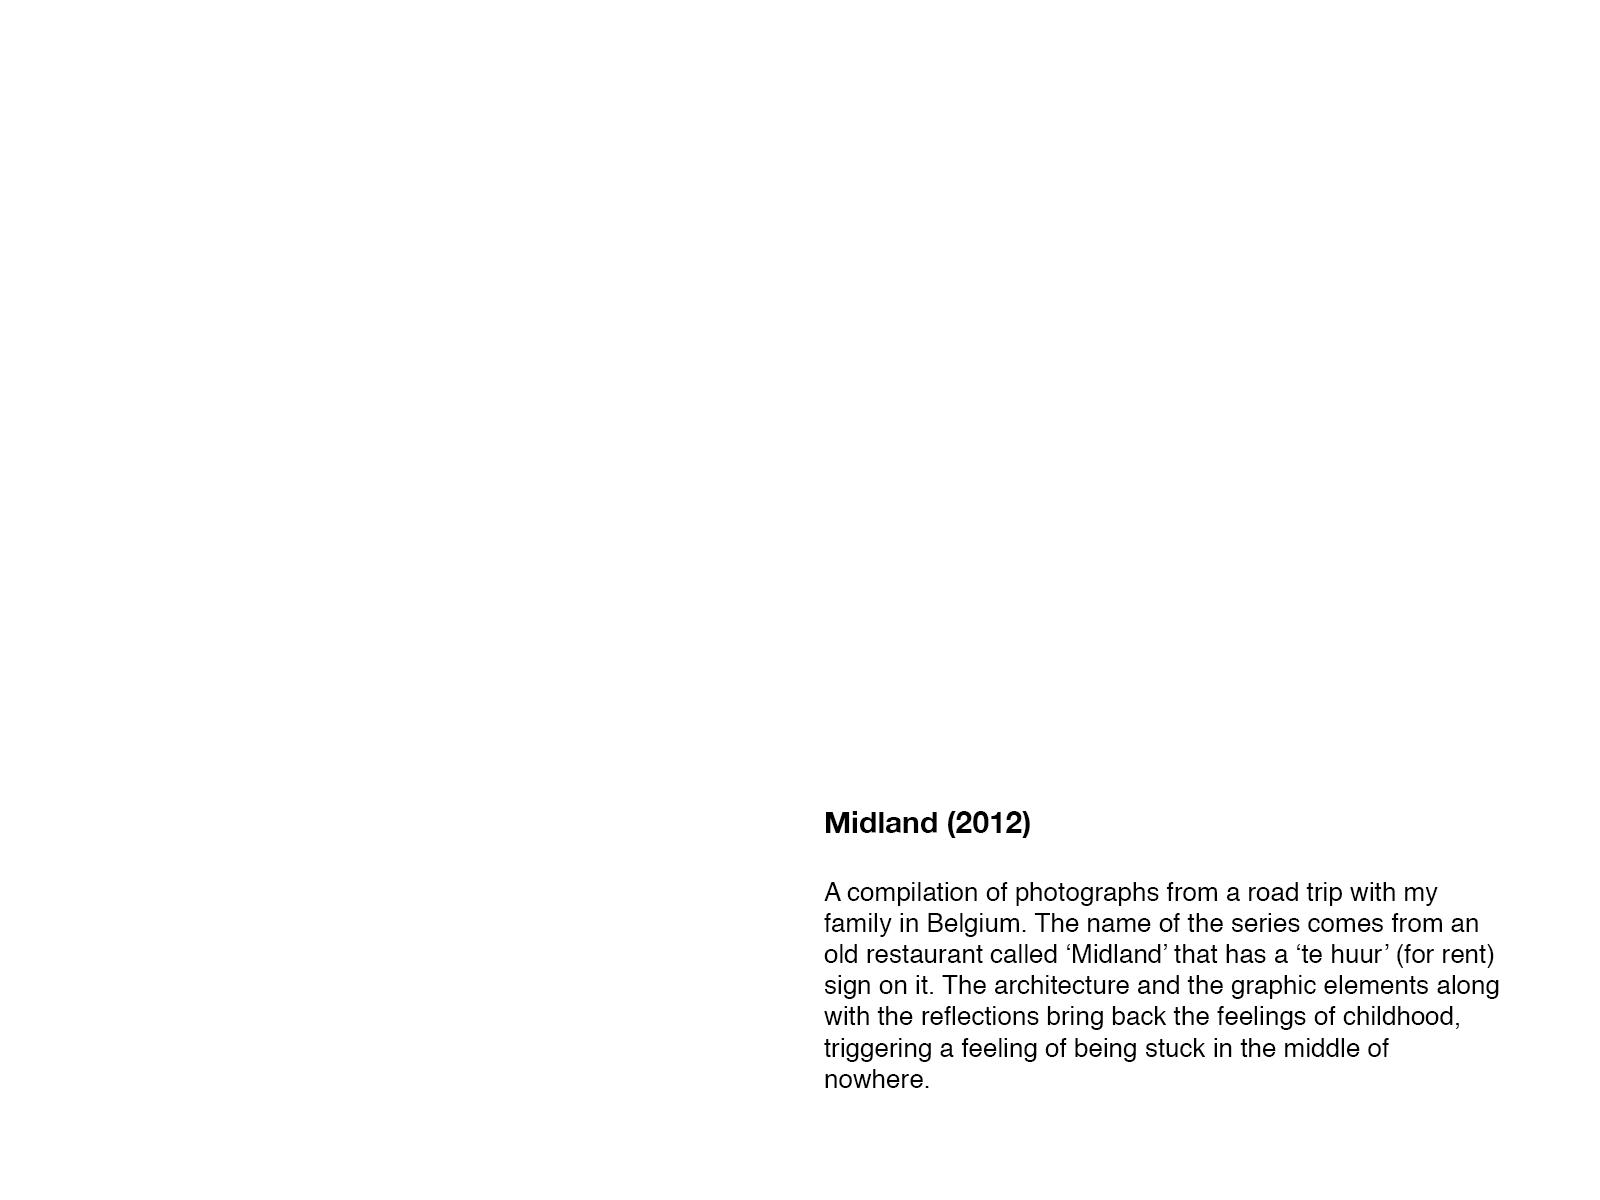 text_midland.jpg